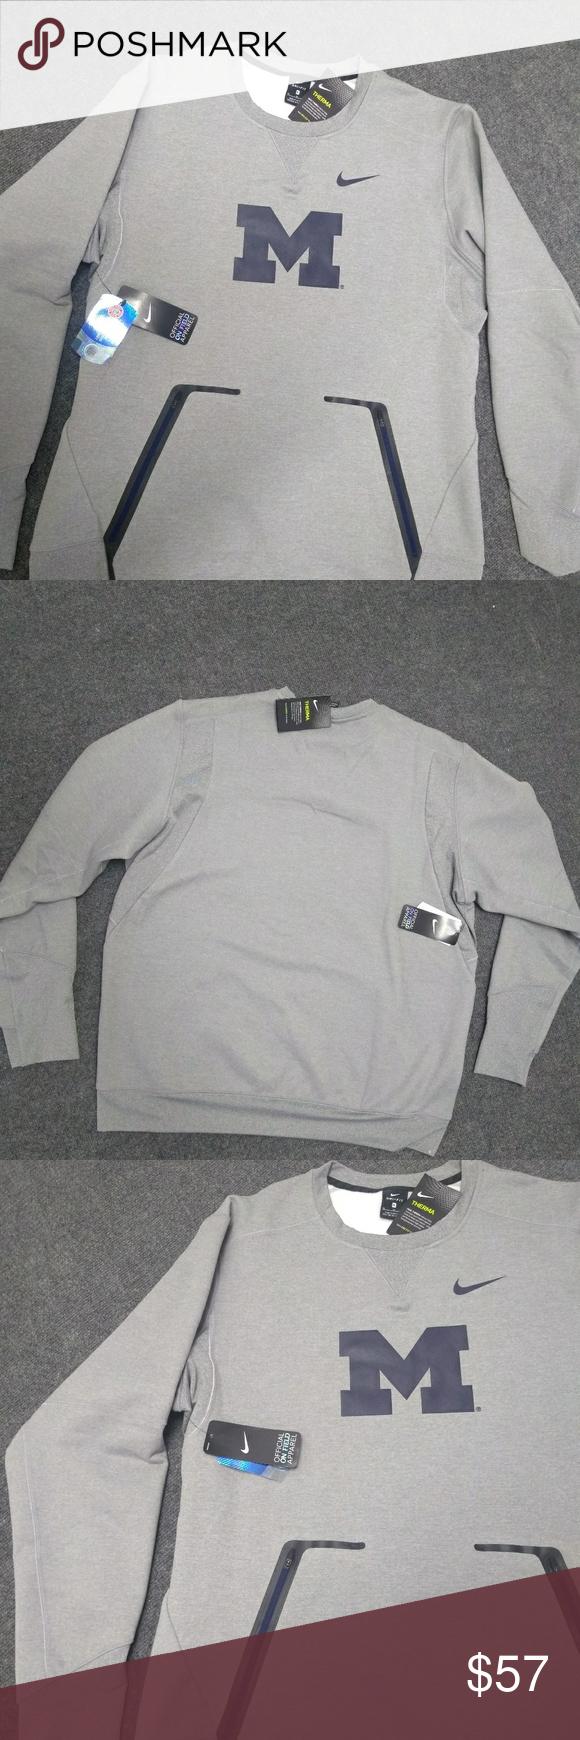 Nike Michigan Crew Sweatshirt Crew Sweatshirts Sweatshirts Sweatshirt Shirt [ 1740 x 580 Pixel ]